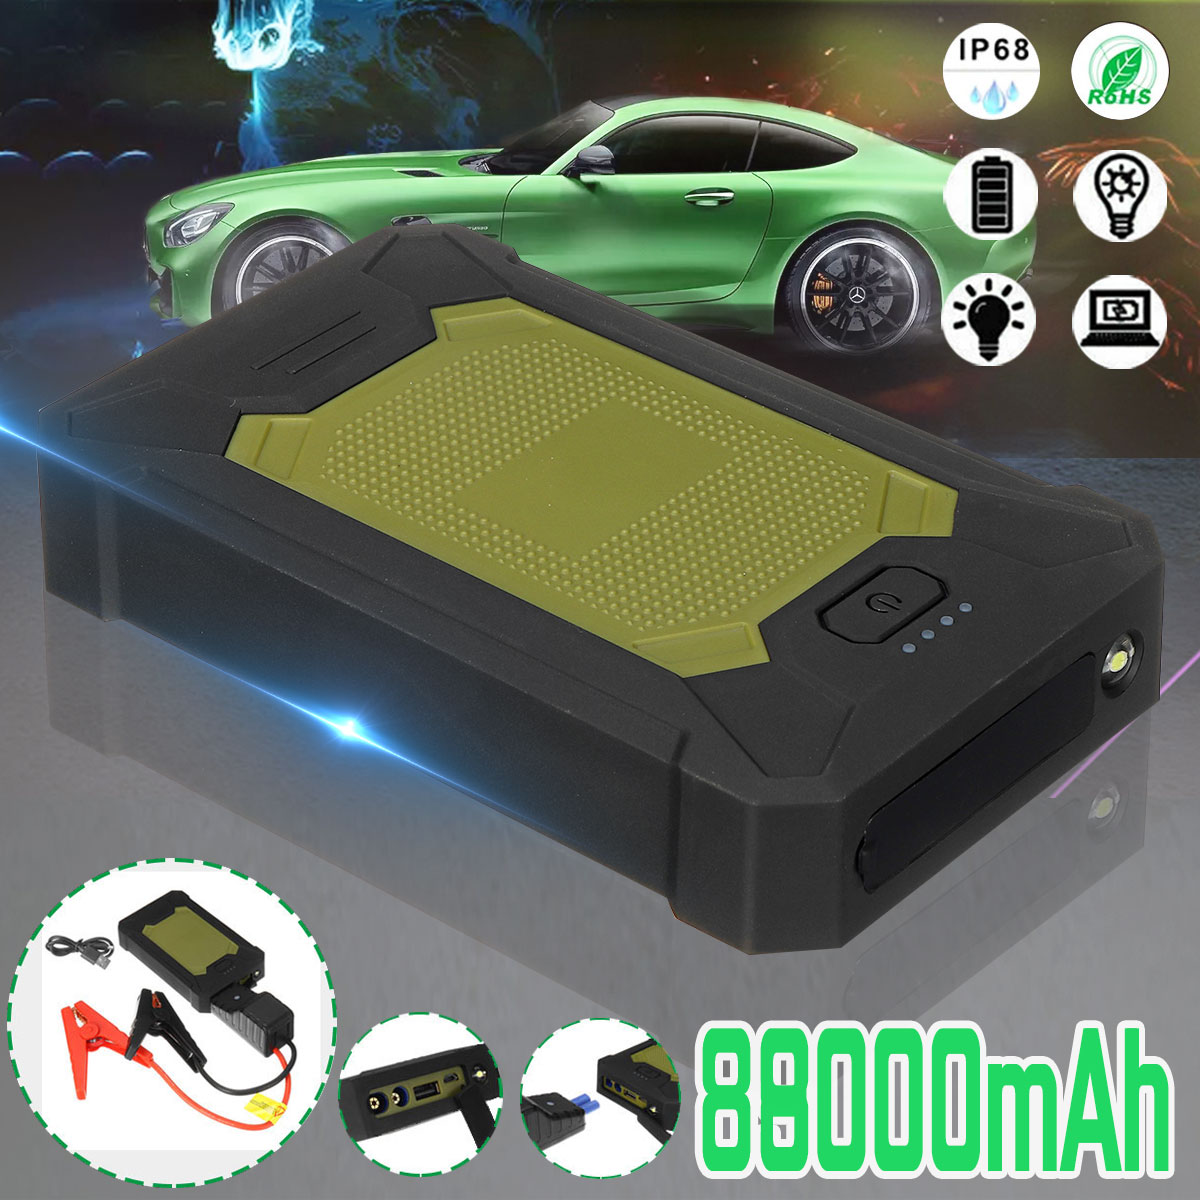 88800mAh Car Jump Starter 5V 600A 4 USB LED Portable Slim Emergency Power Bank Battery For Car Mobile Phones IP66 Waterproof